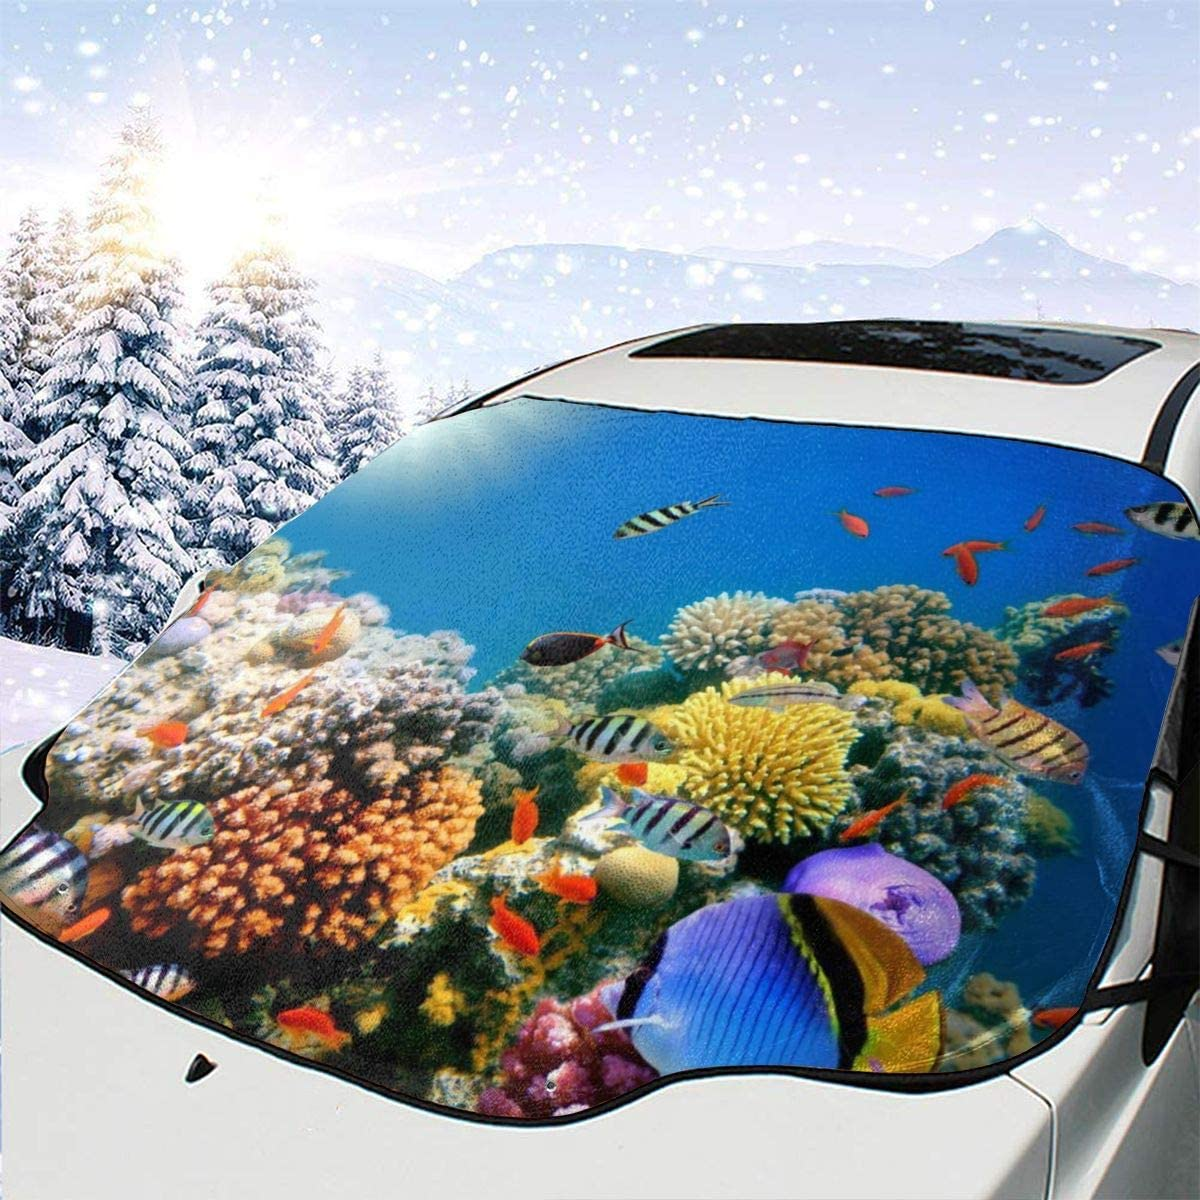 THONFIRE Car Front Window Windshields Snow Sunshade Underwater Fishes Cover Snow Proof Blocks UV Rays Damage Free Visor Protector Minivan Summer Heat Insulation